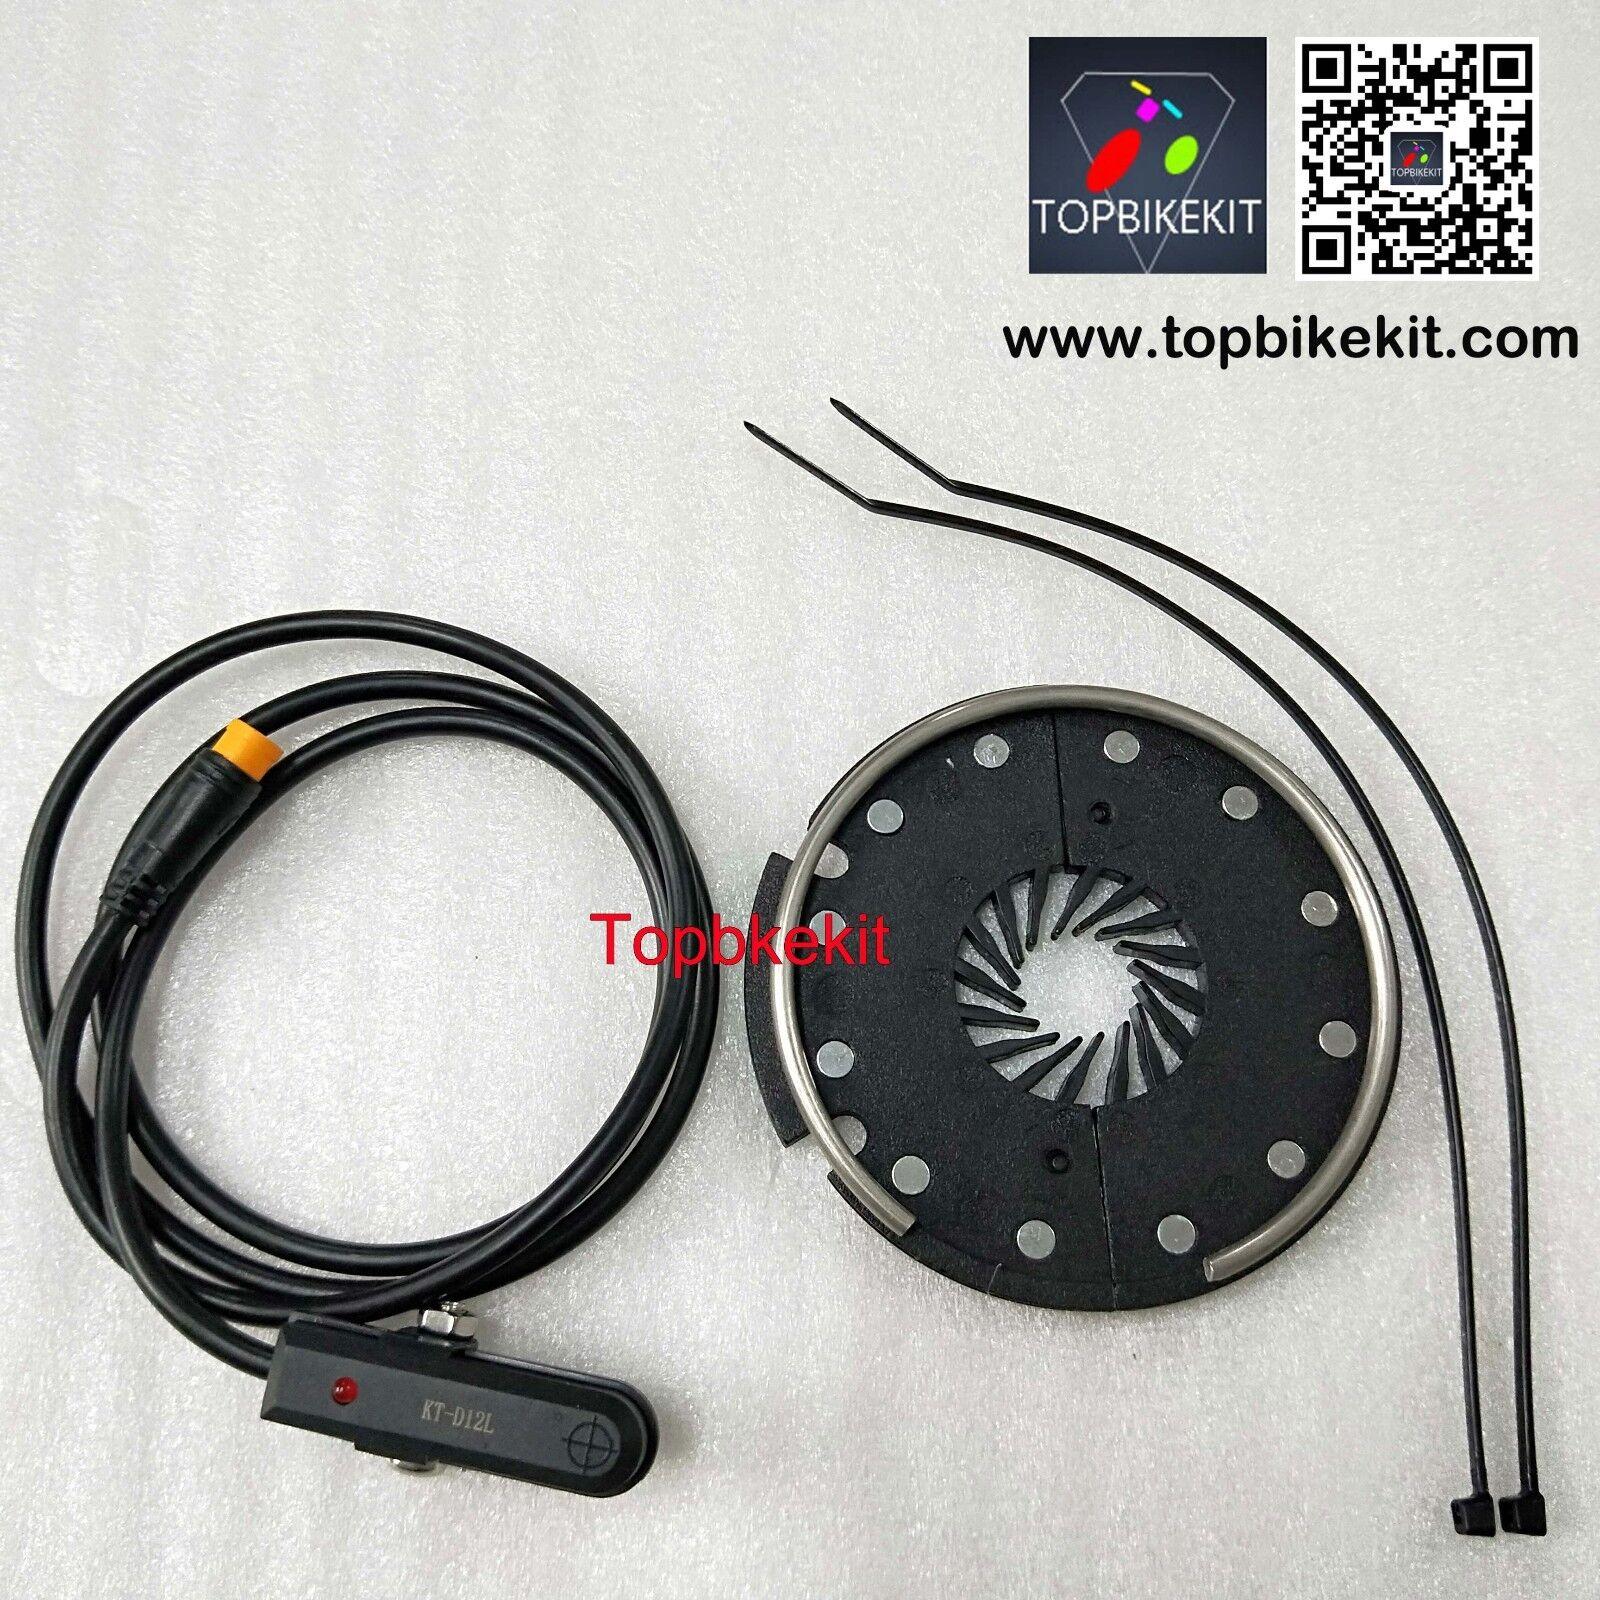 KT D12L Dual Hall Sensor Signals Easy InsDimensionetion Julei 3 Pins waterproof Plug